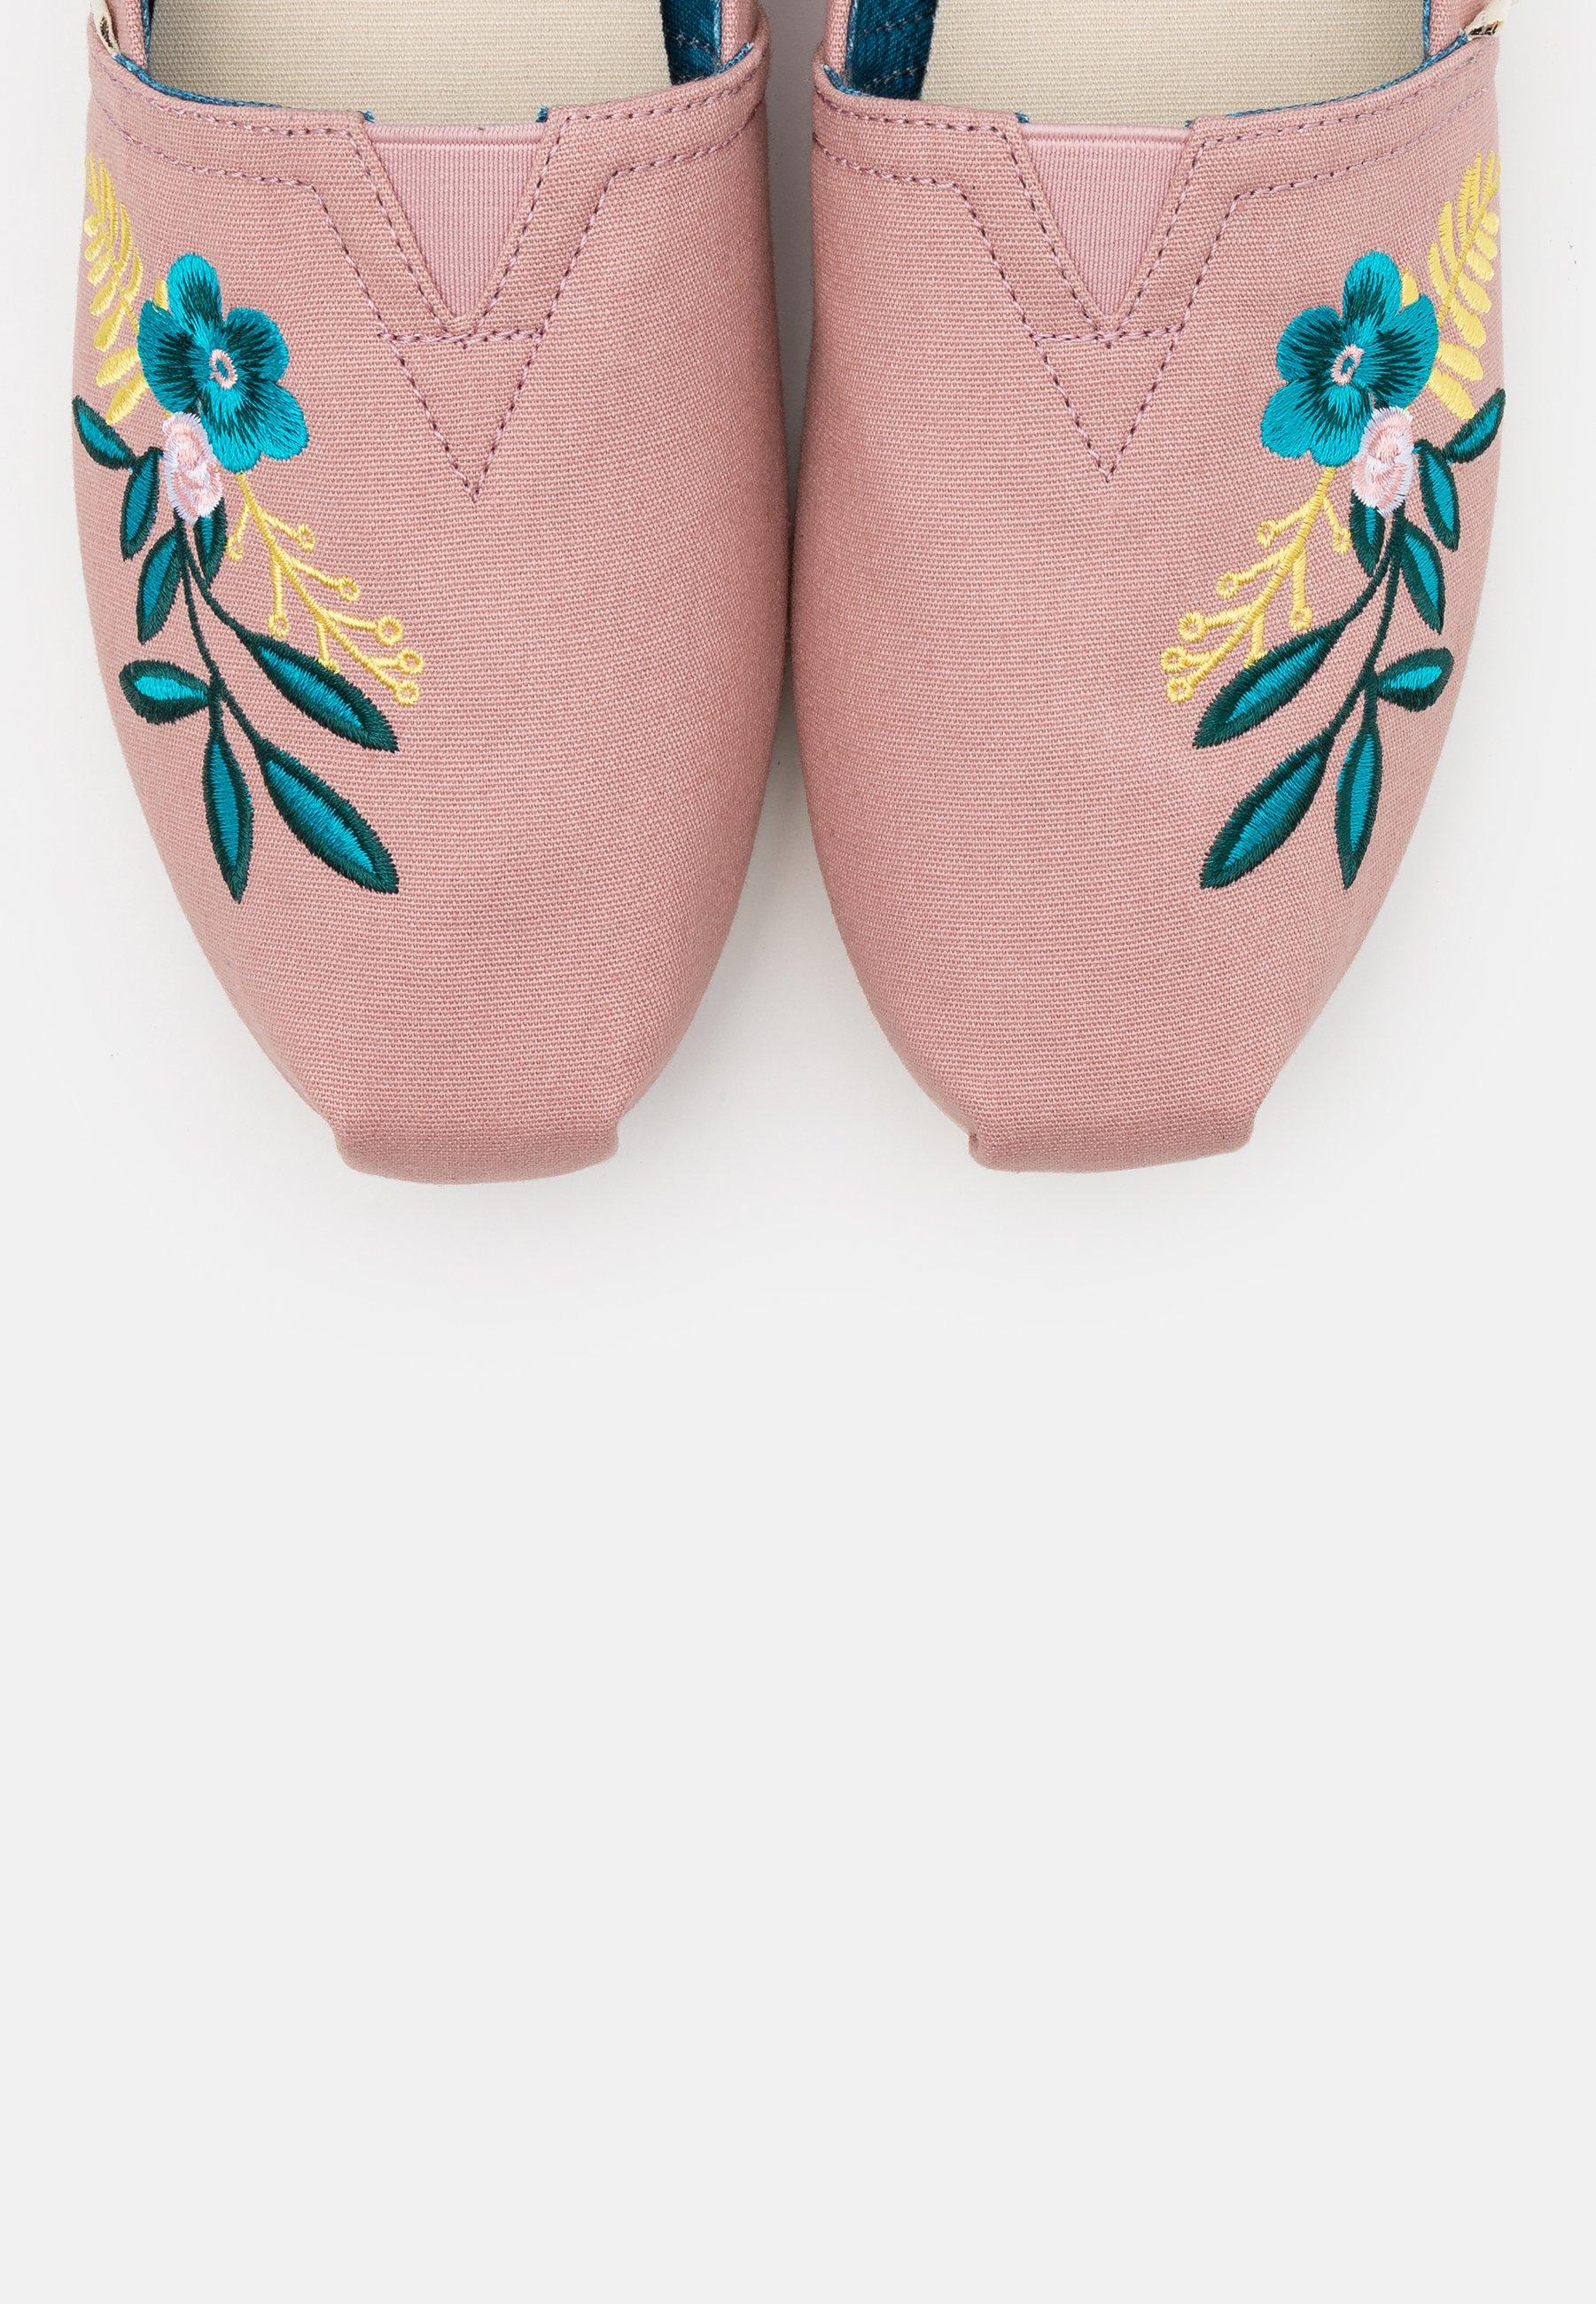 Scarpe da donna TOMS ALPARGATA Scarpe senza lacci pink